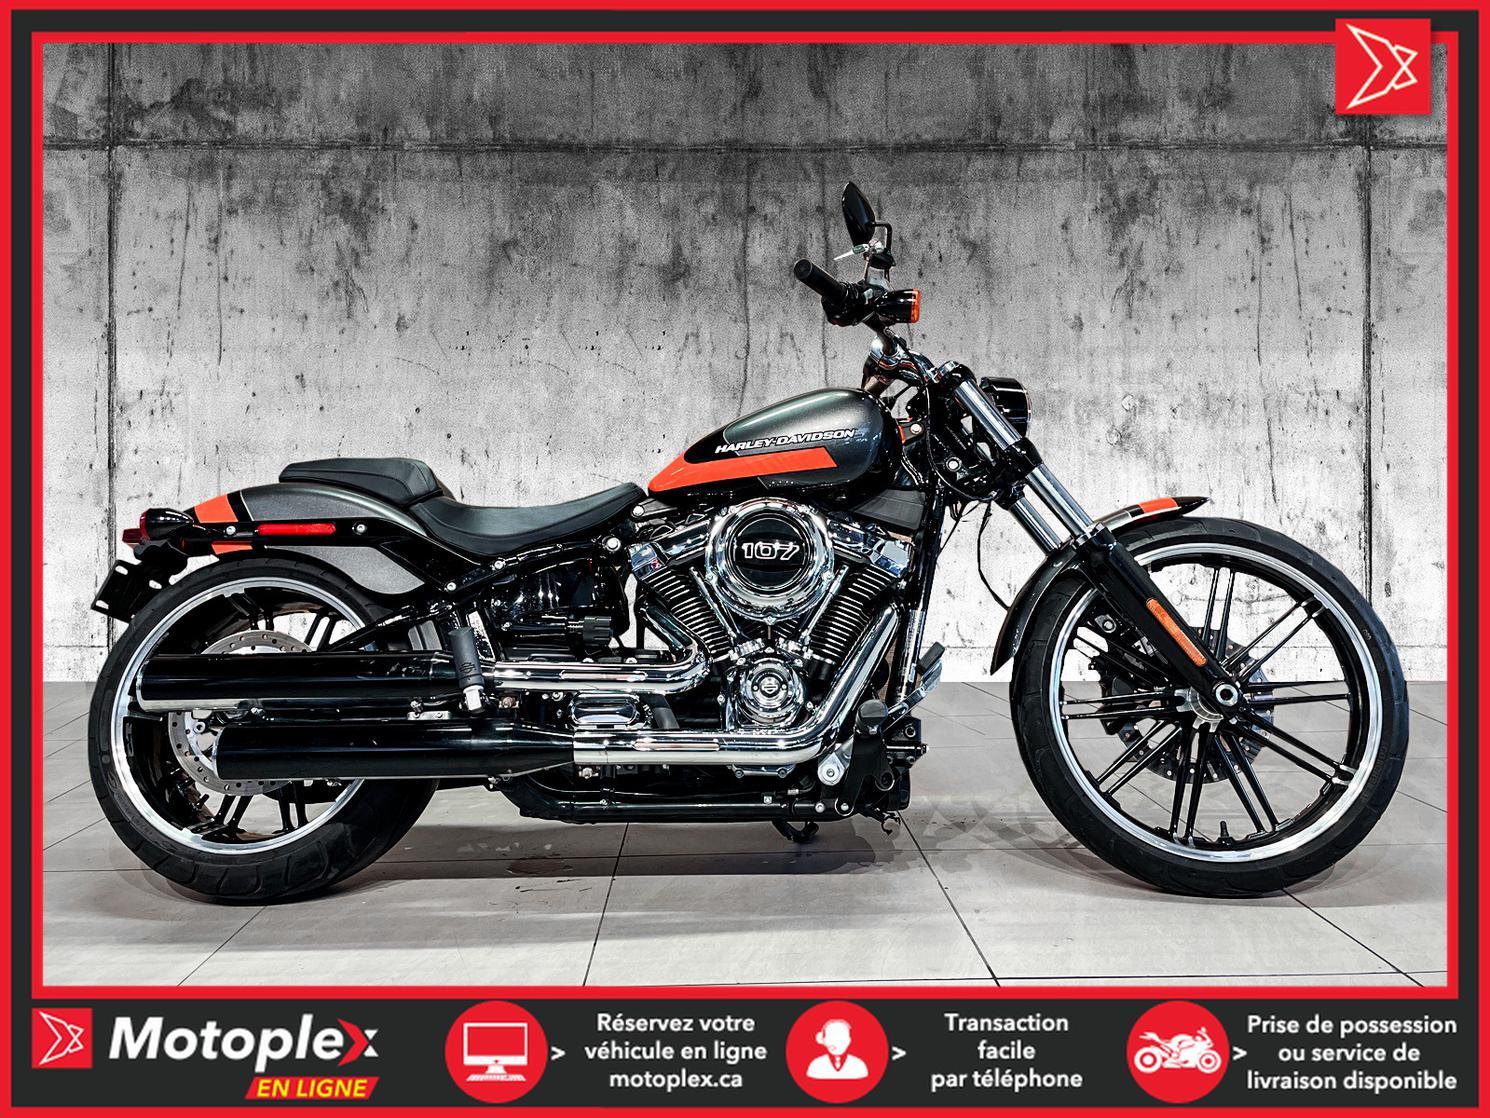 U4912 Harley-Davidson BREAKOUT-107-FXBR-LIMITED PAINT 2019